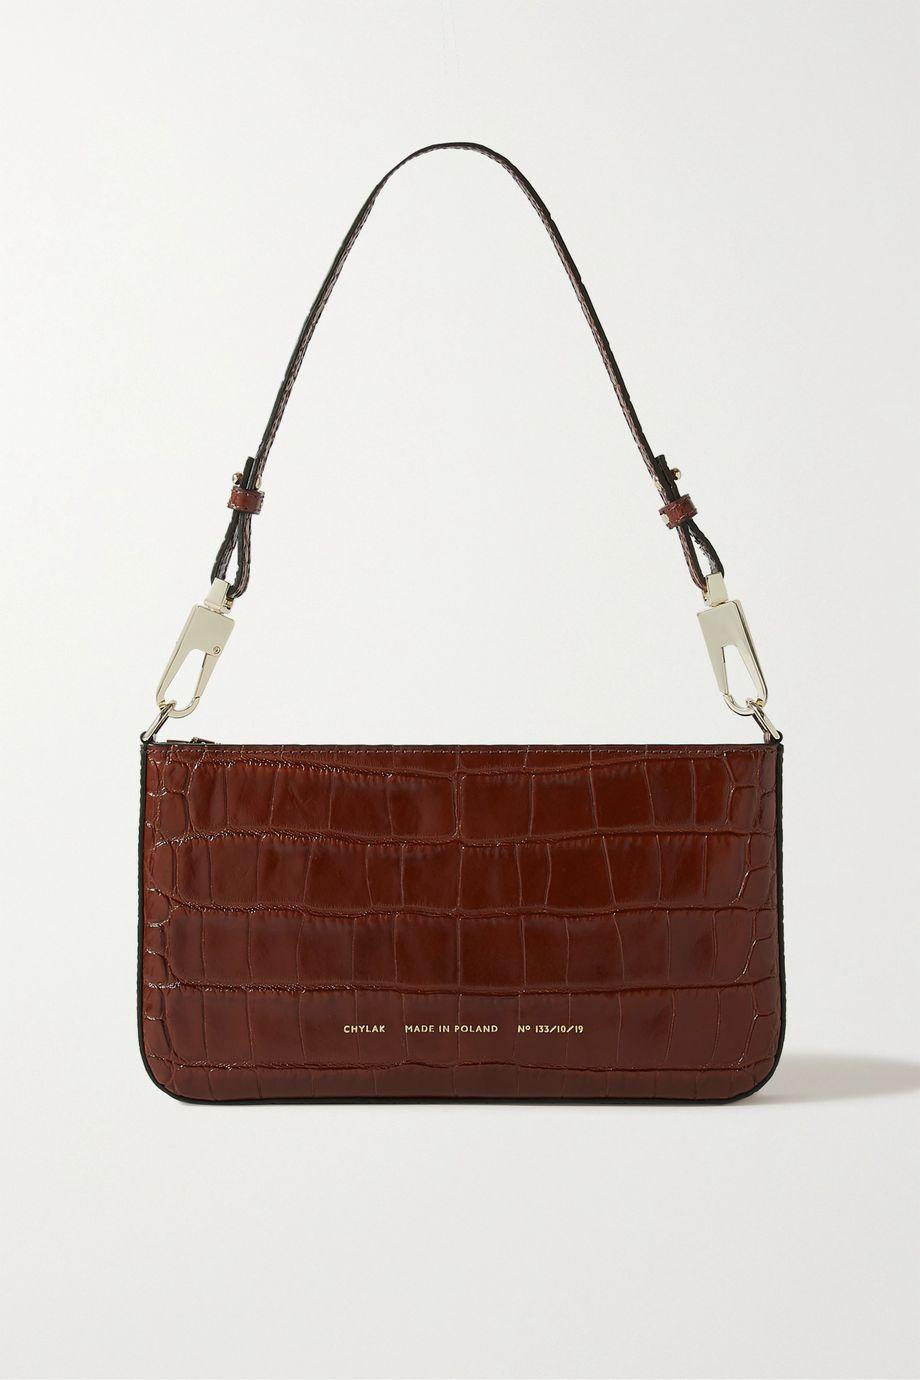 Chylak Underarm glossed croc-effect leather shoulder bag